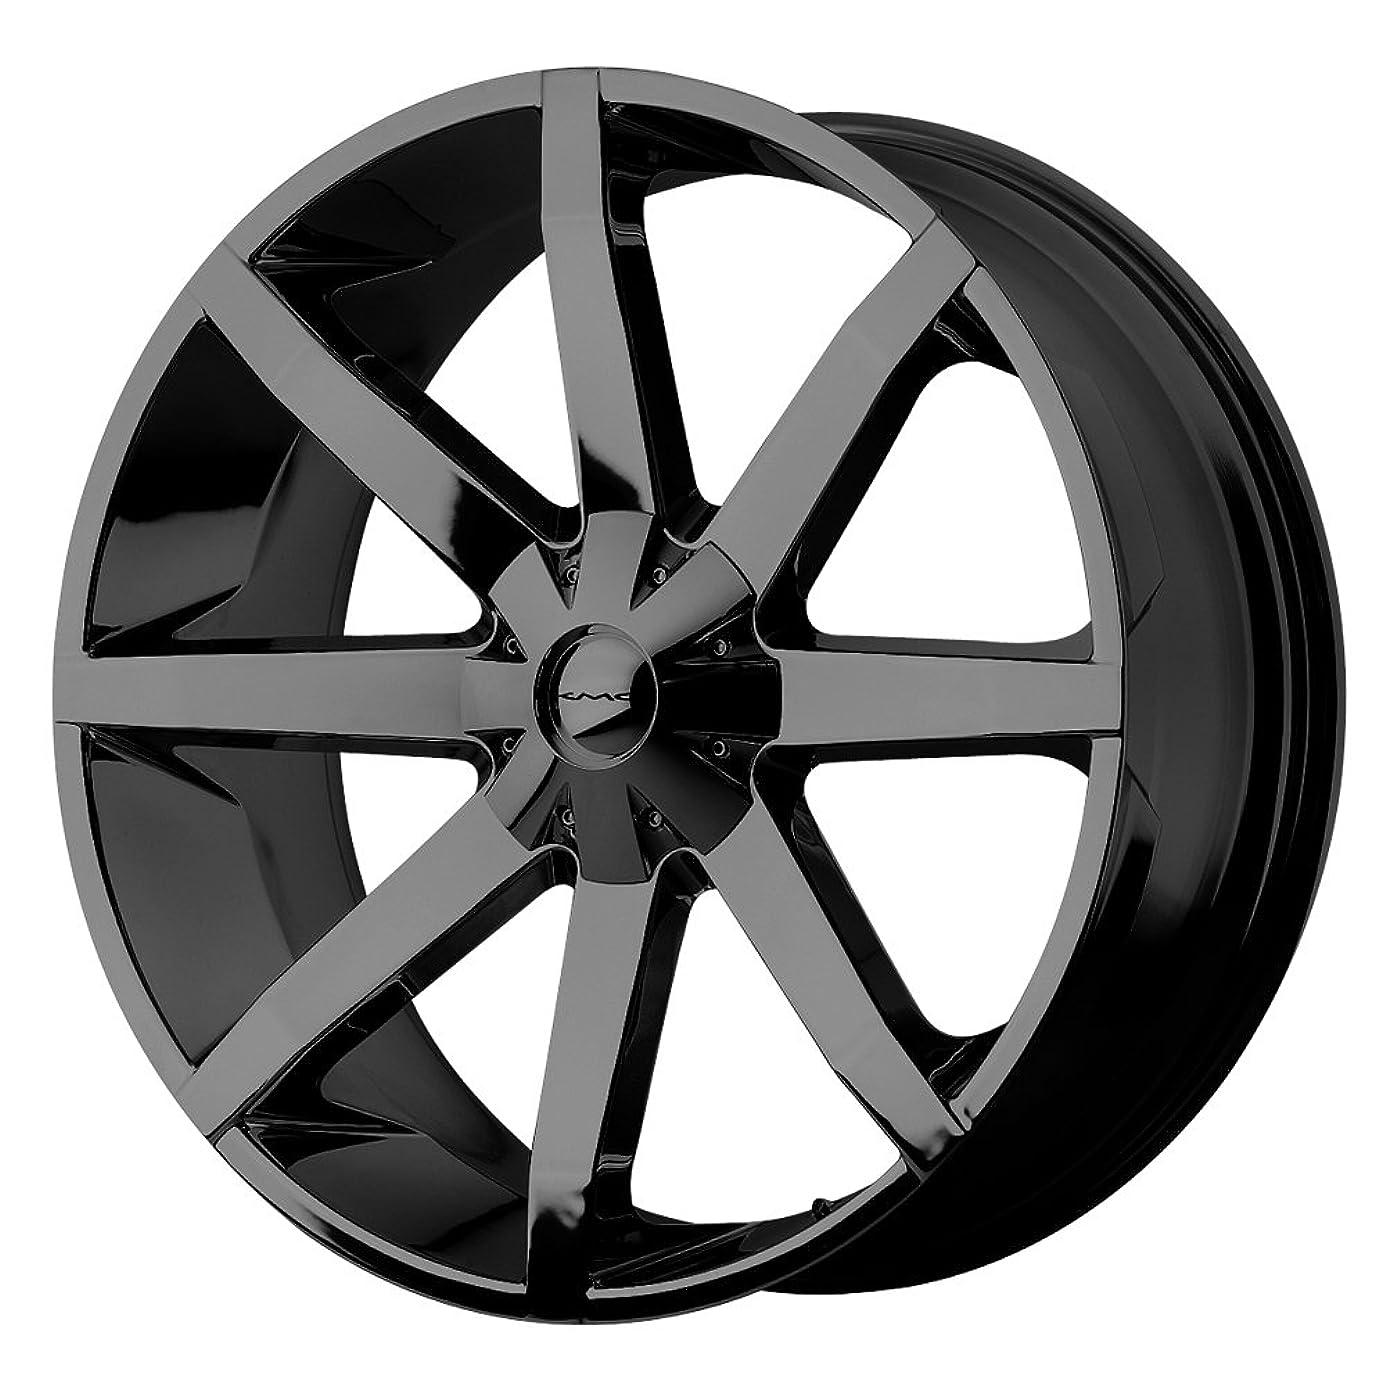 KMC Wheels KM651 Slide Gloss Black Wheel With Clearcoat (22x9.5